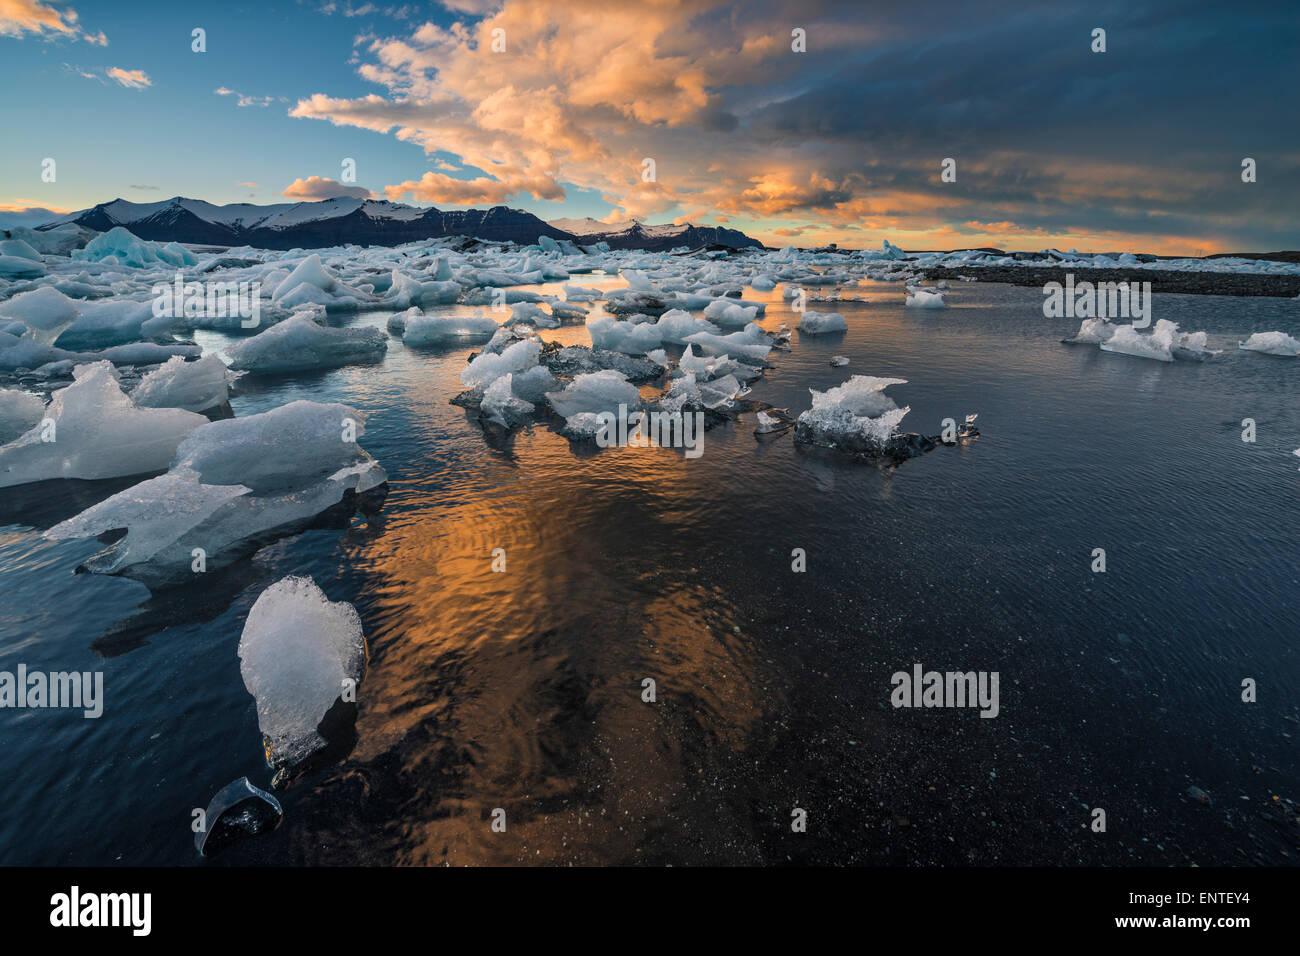 Iceland landscape - Vatnajokull National Park, Sunset at Jokulsarlon Lagoon - Stock Image